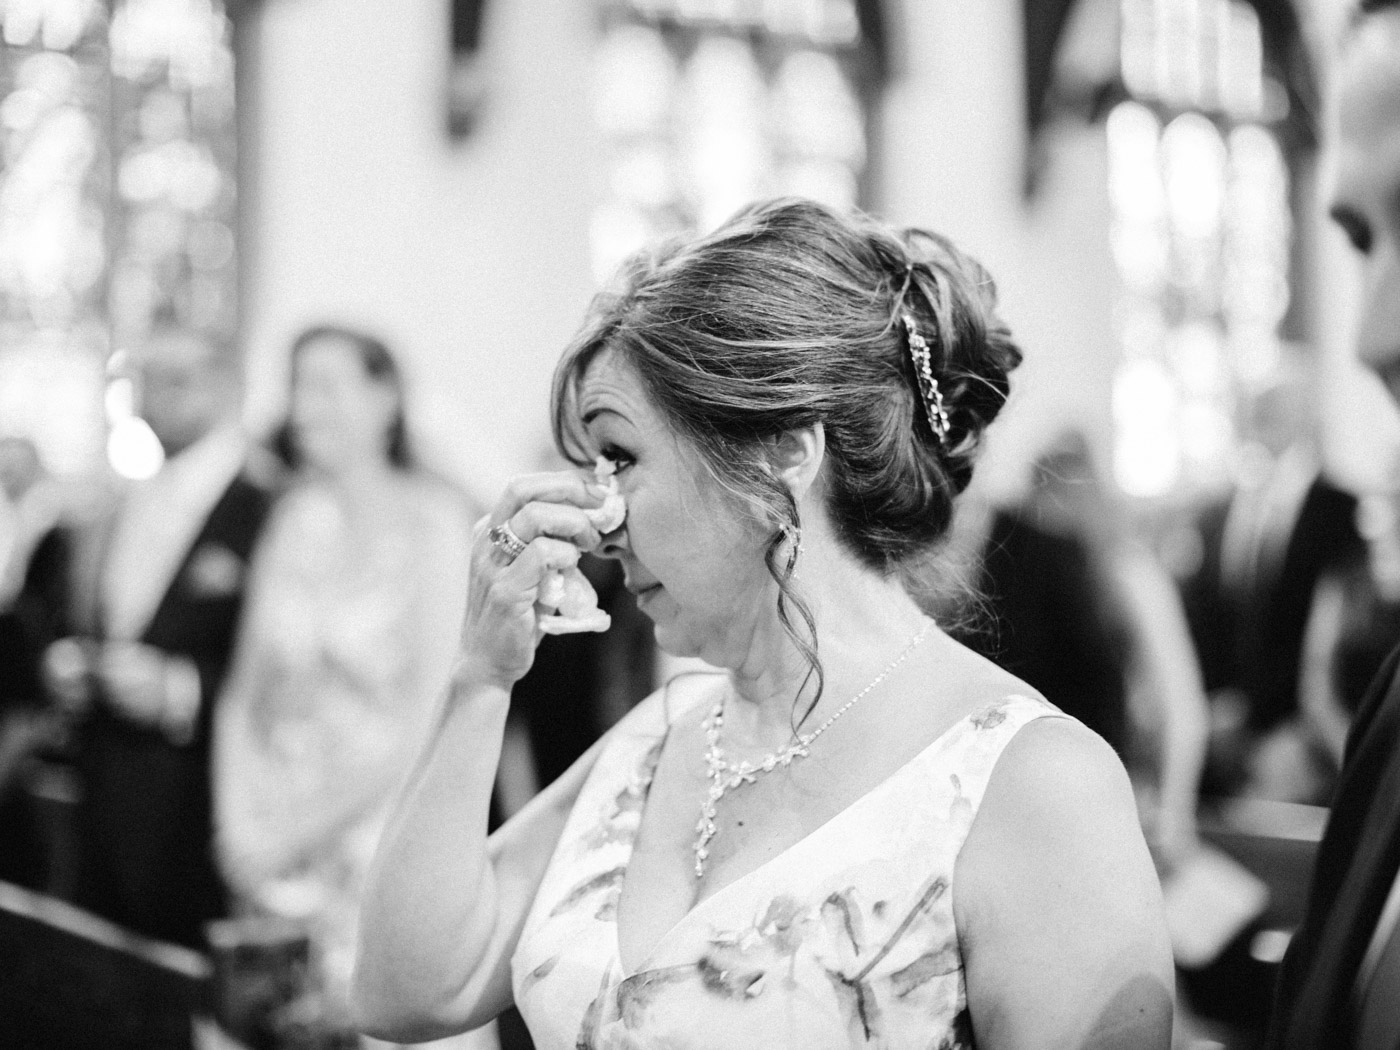 toronto_wedding_photographer_fine_art_documentary-168.jpg